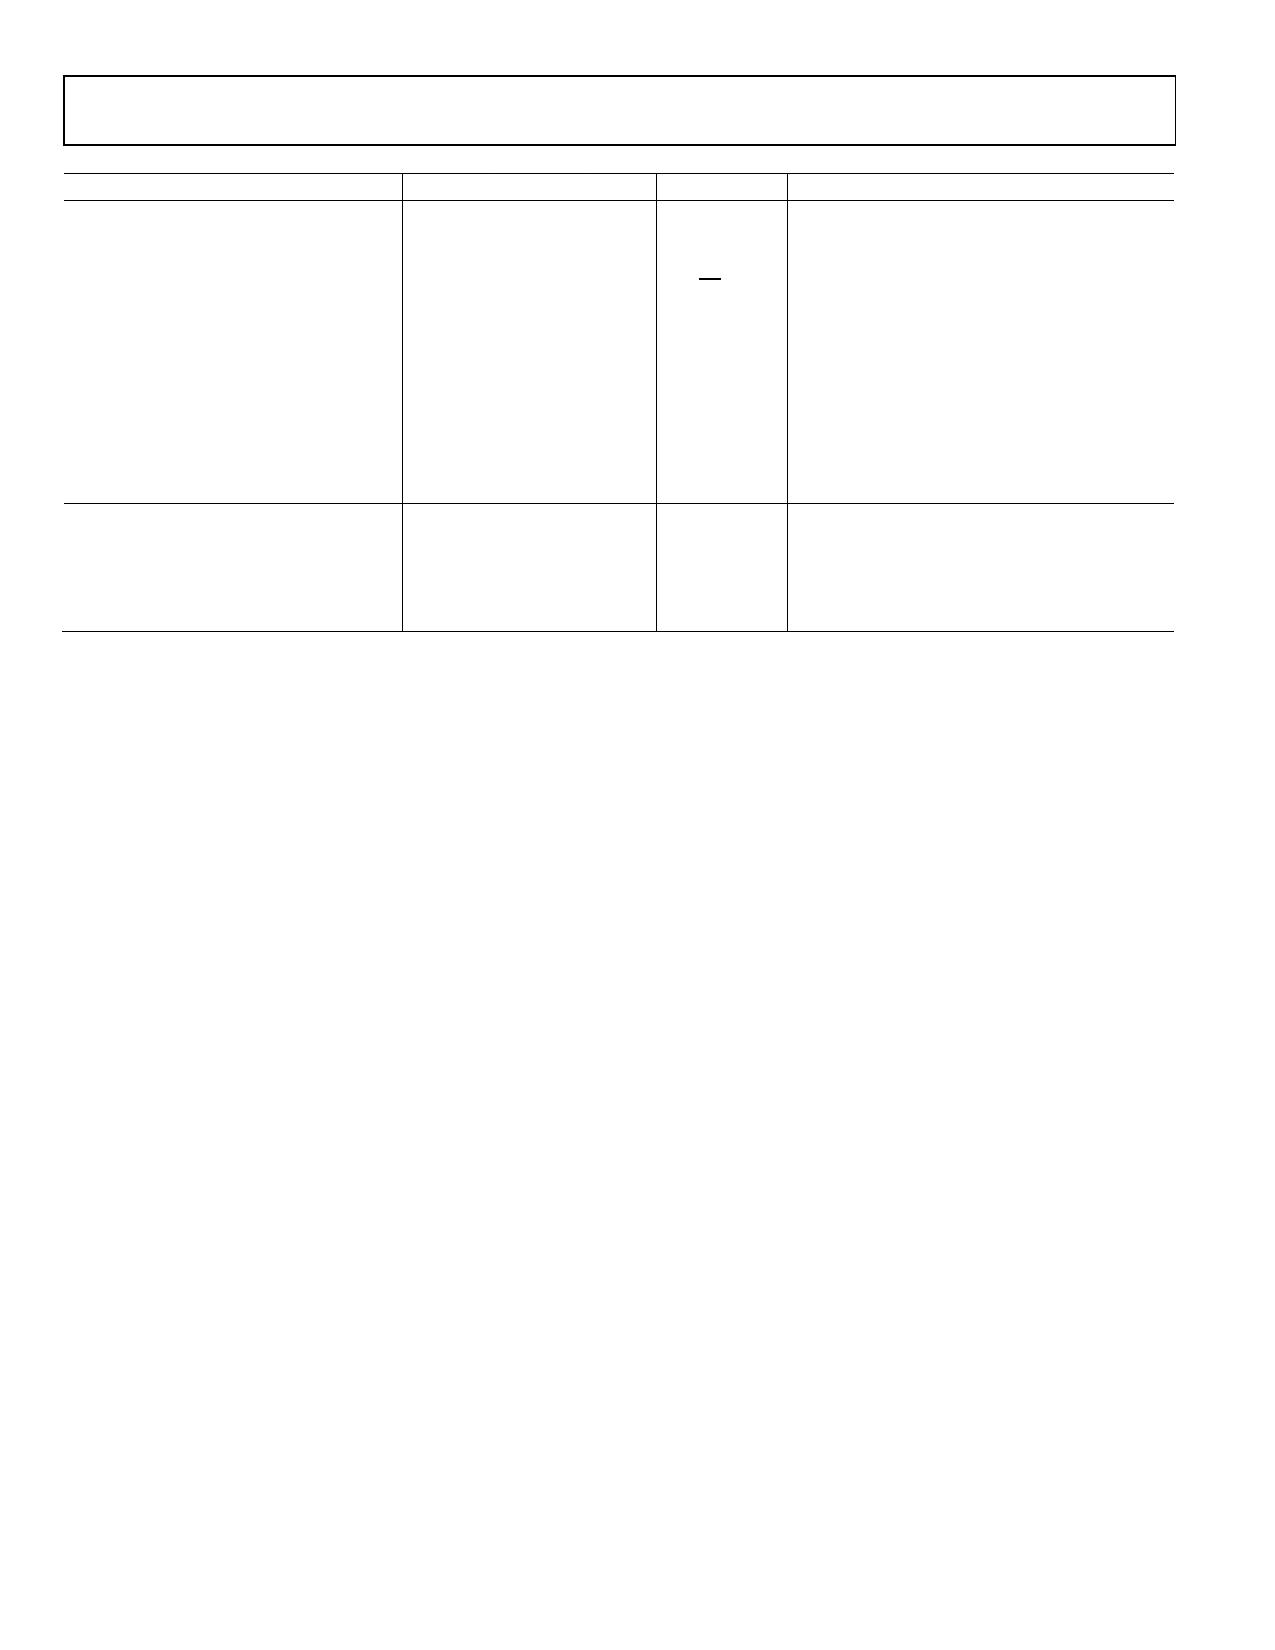 AD5425 pdf, arduino